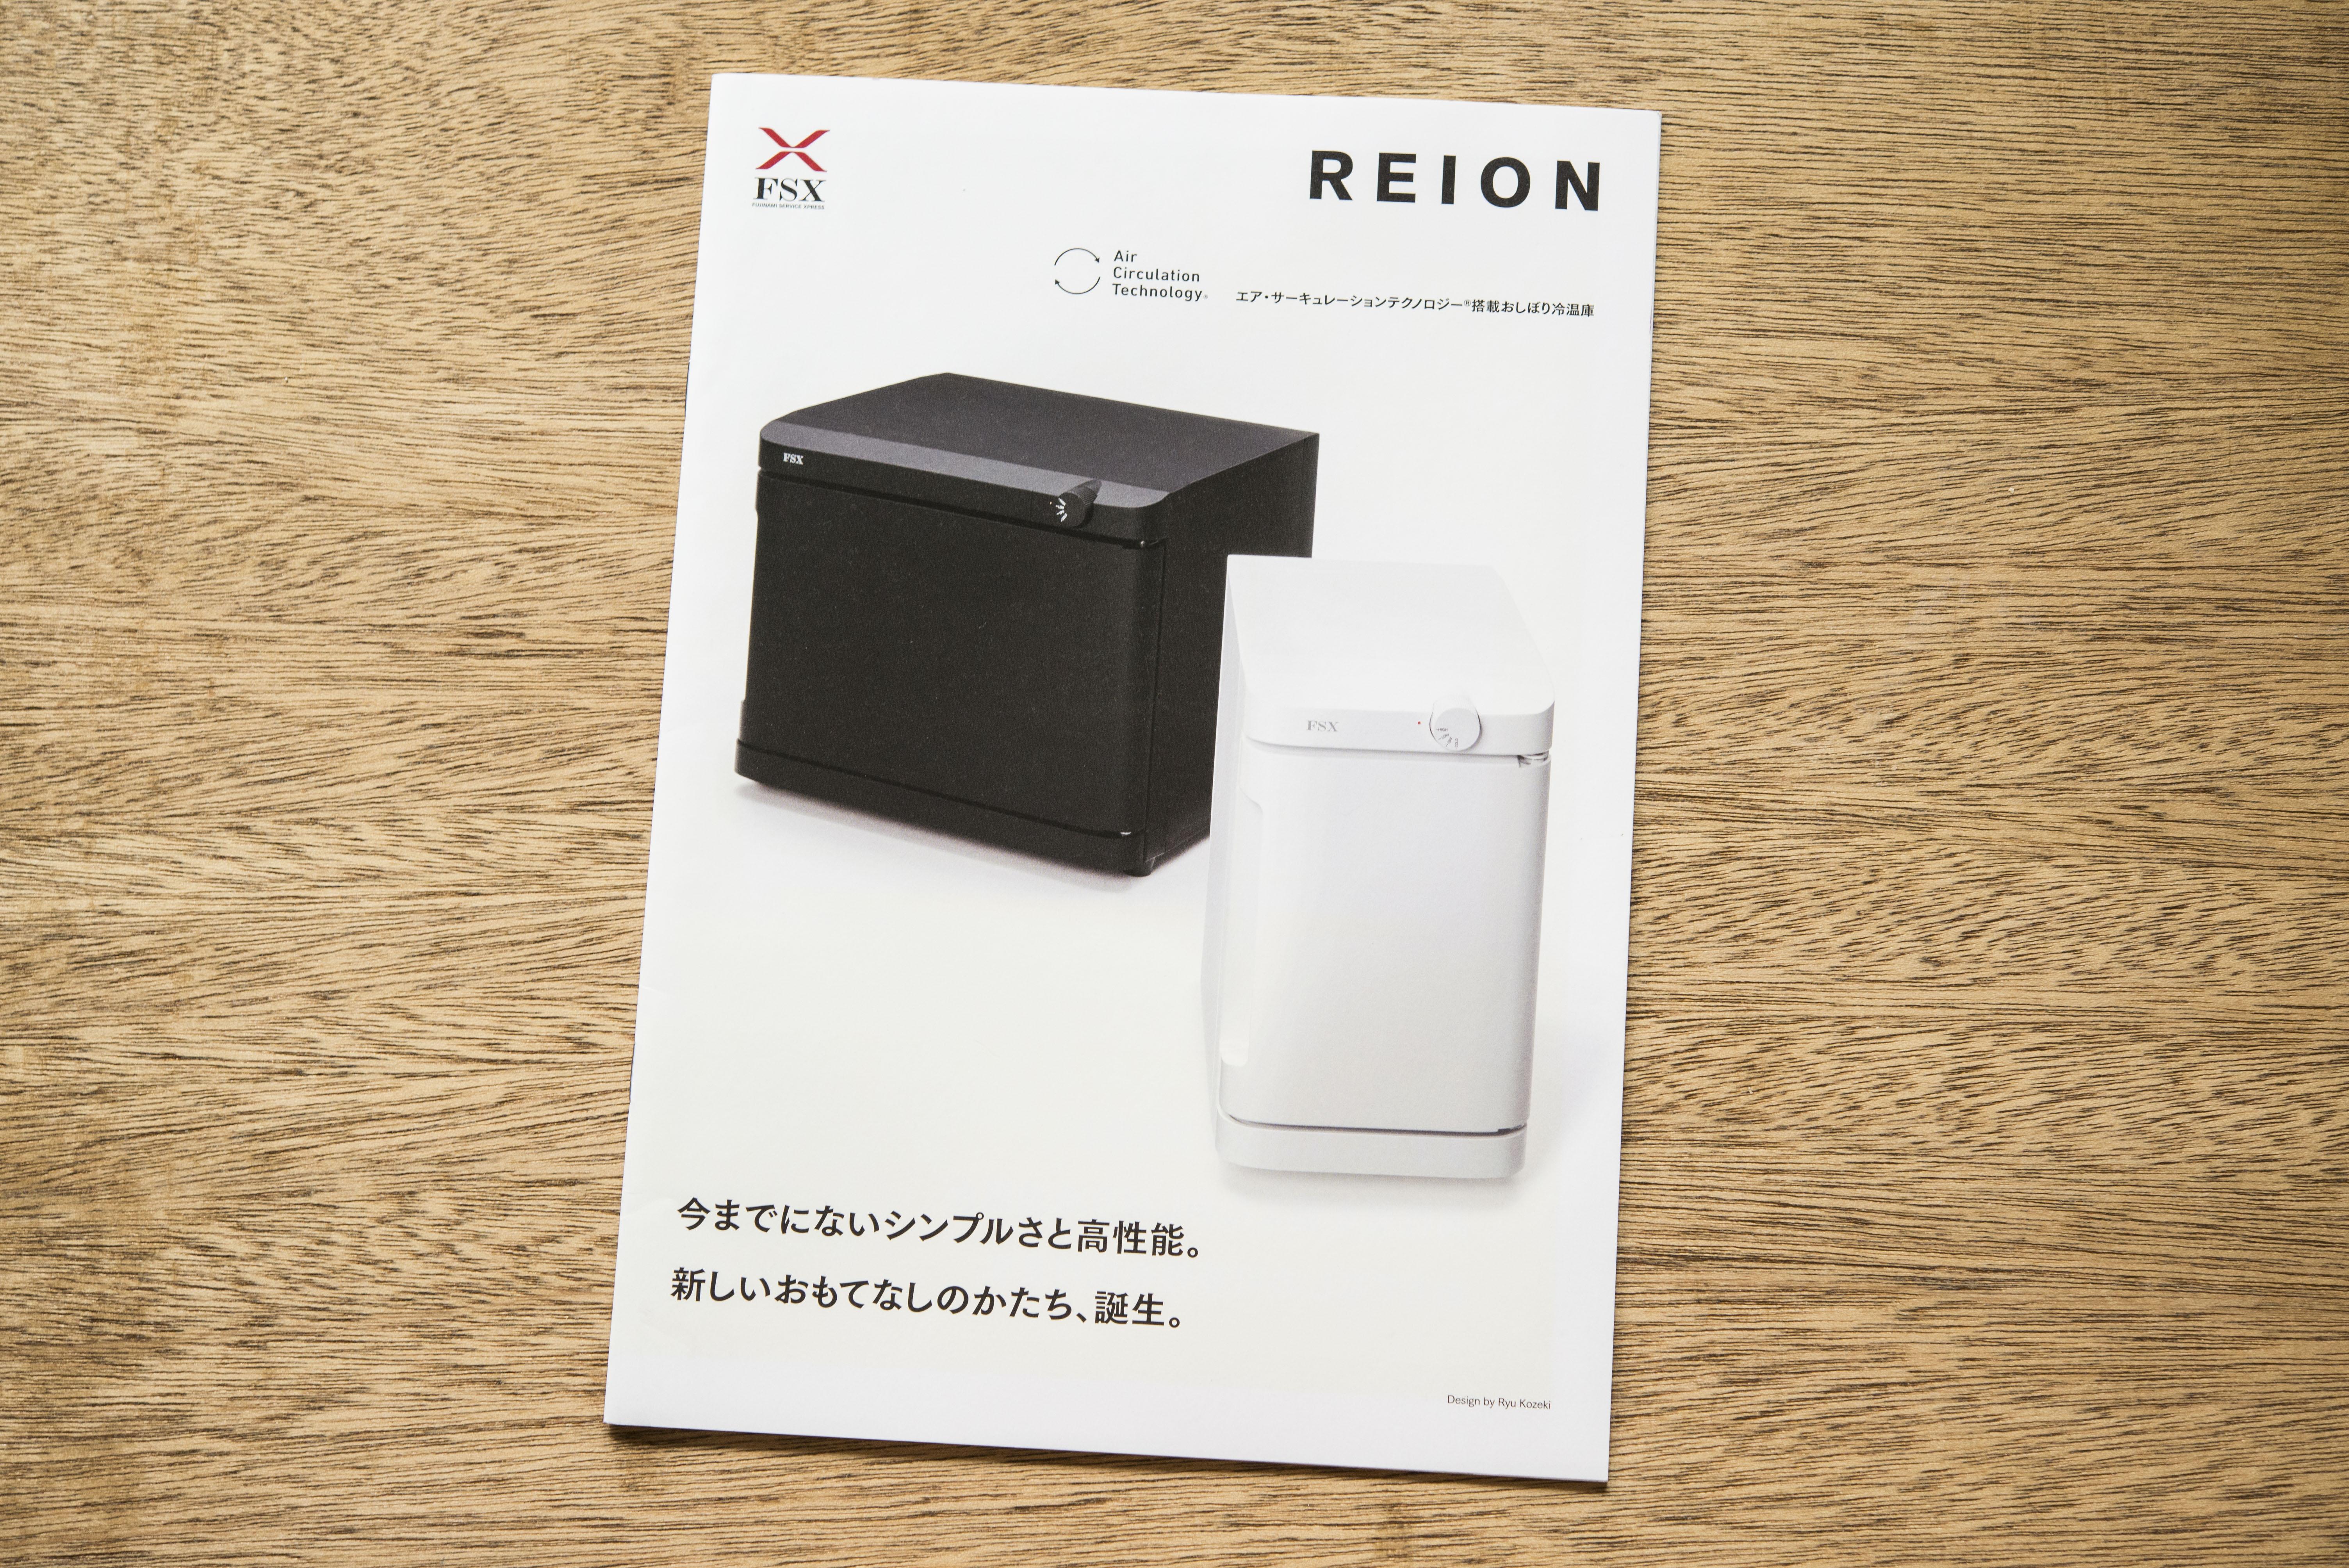 REION  FSX株式会社